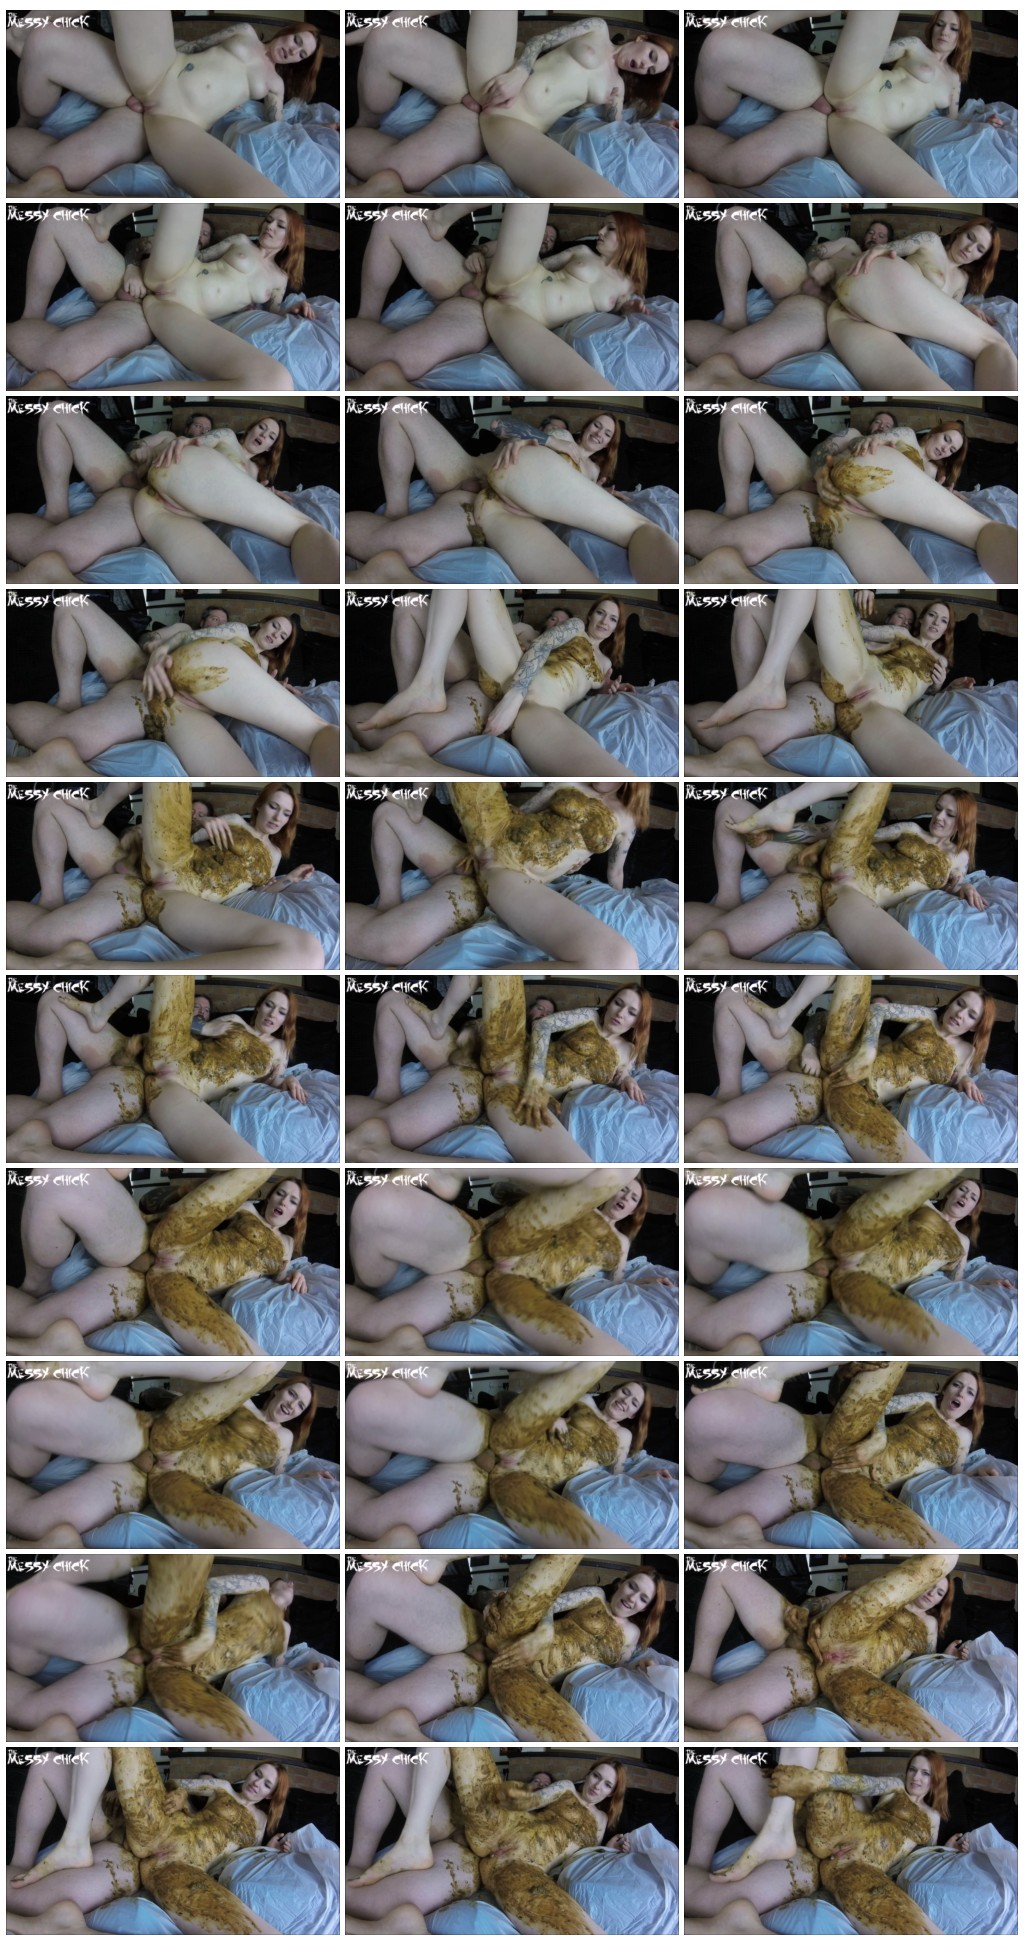 Themessychick Co Uk  Scatshop Comanal Pleasuresscat -9061